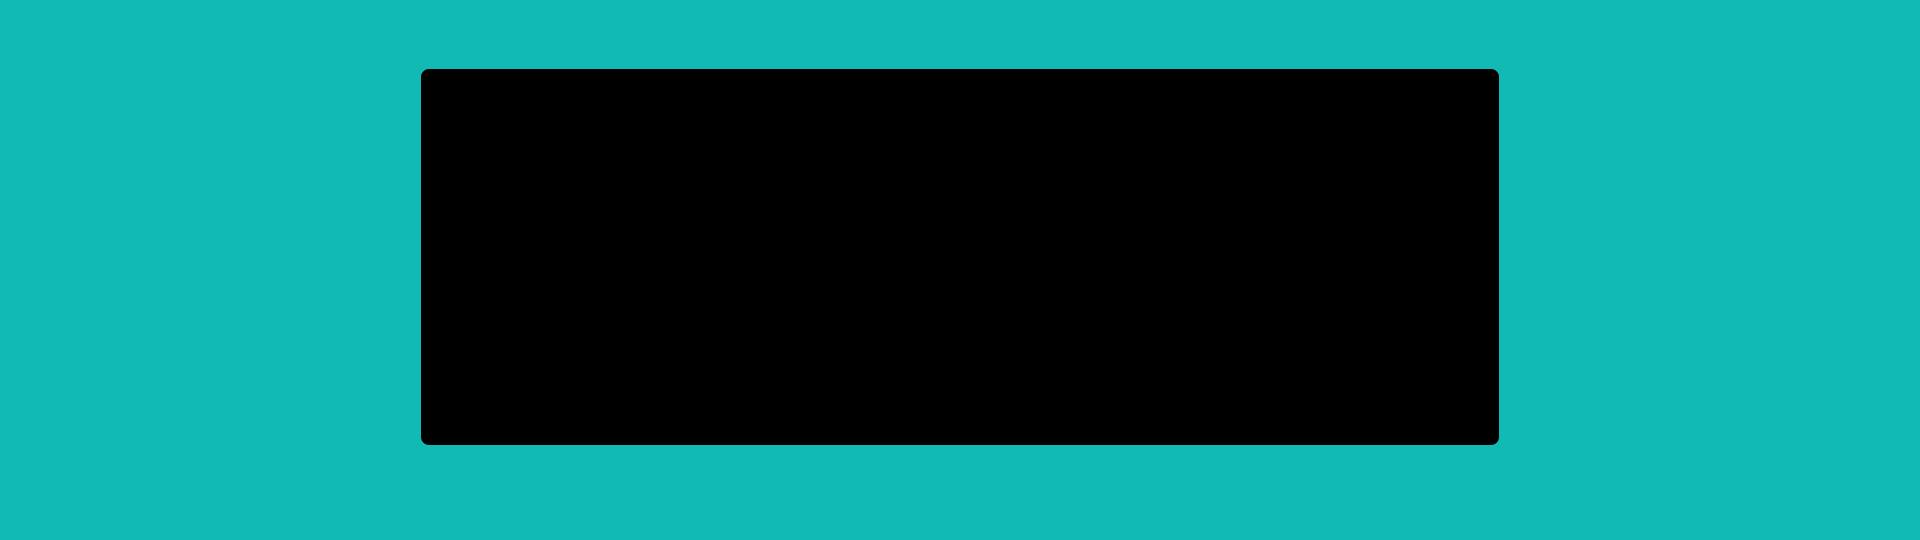 CATEGORY-BILG-KISINDIRIMIBILGISAYARLARVEAKSSEPETTE20-23-02